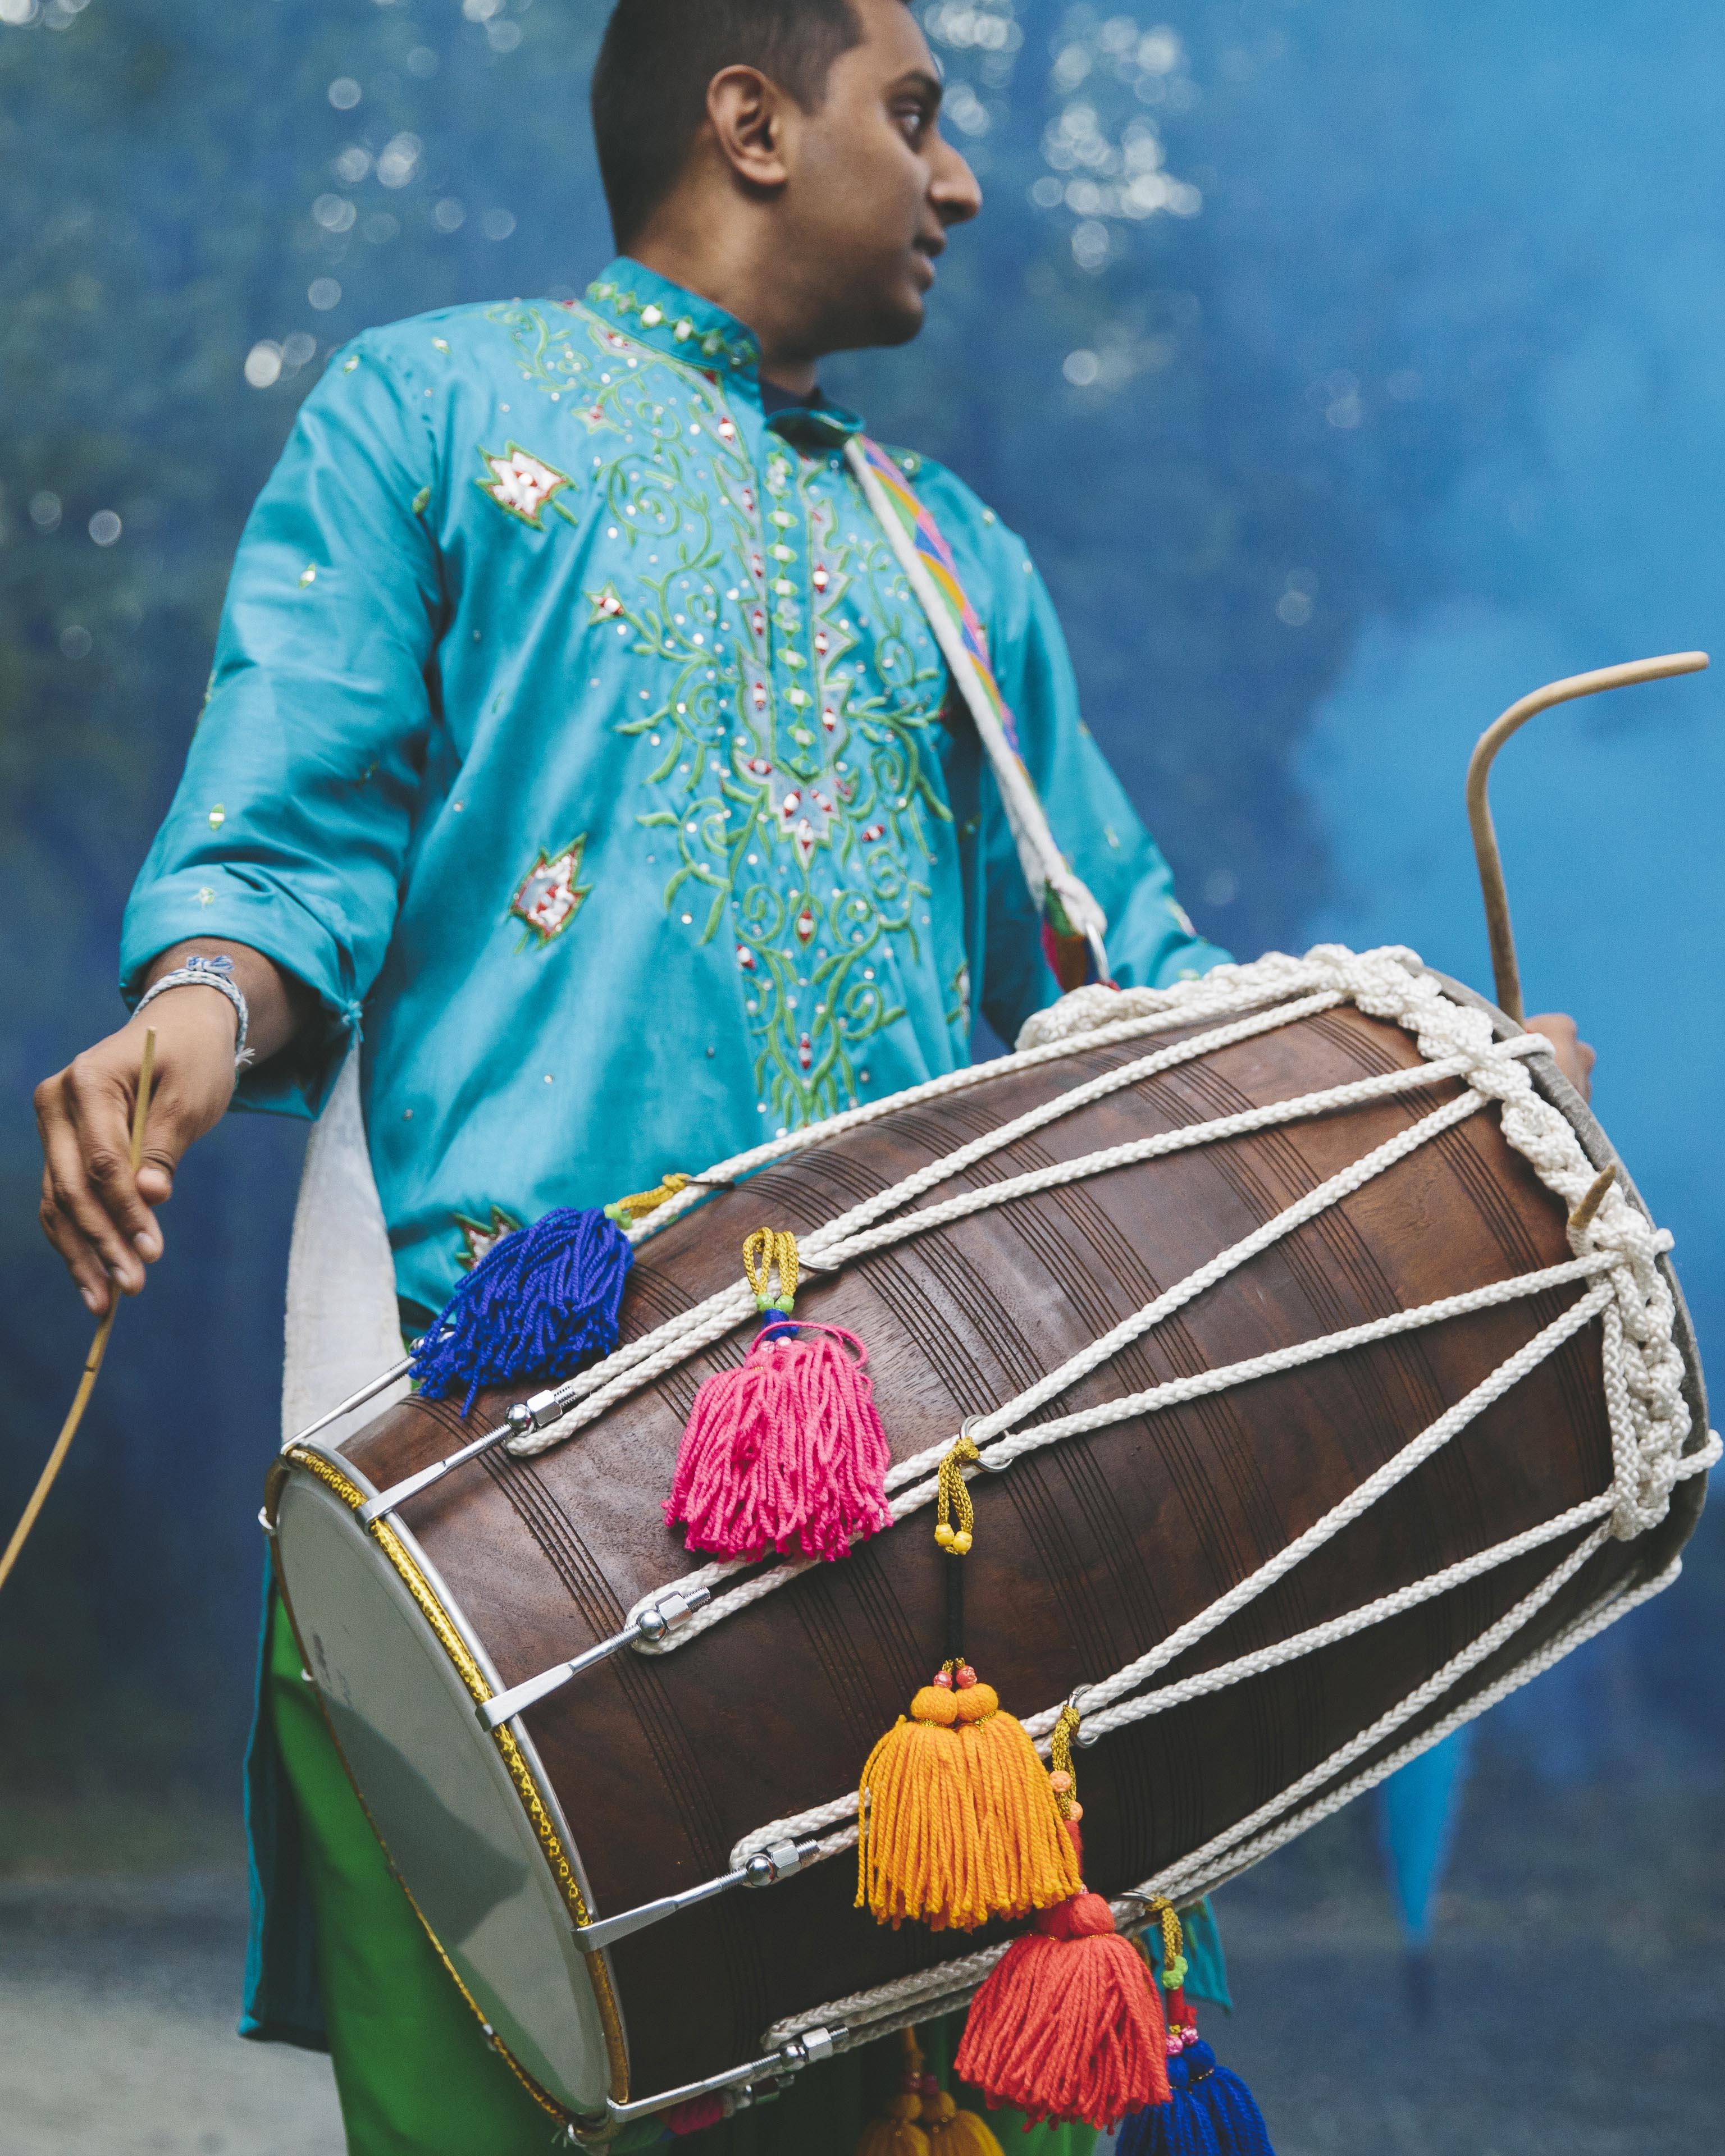 sanjay steven wedding baraat drum